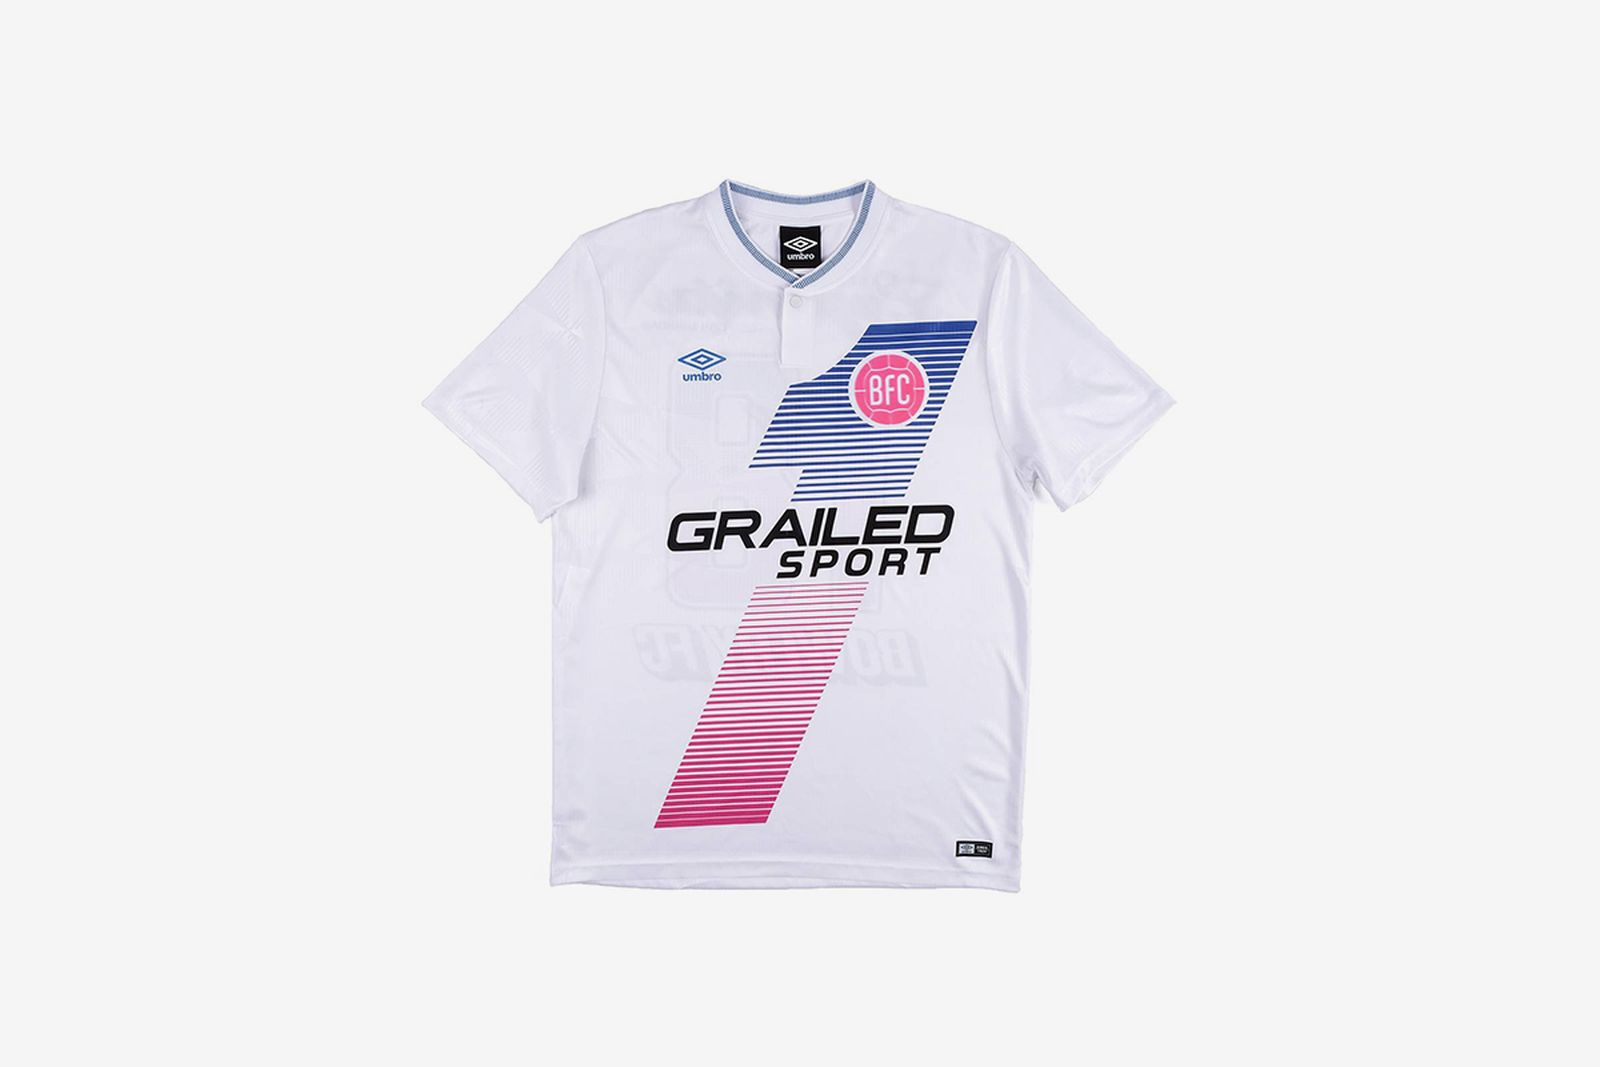 grailed bowery football club soccer kits umbro